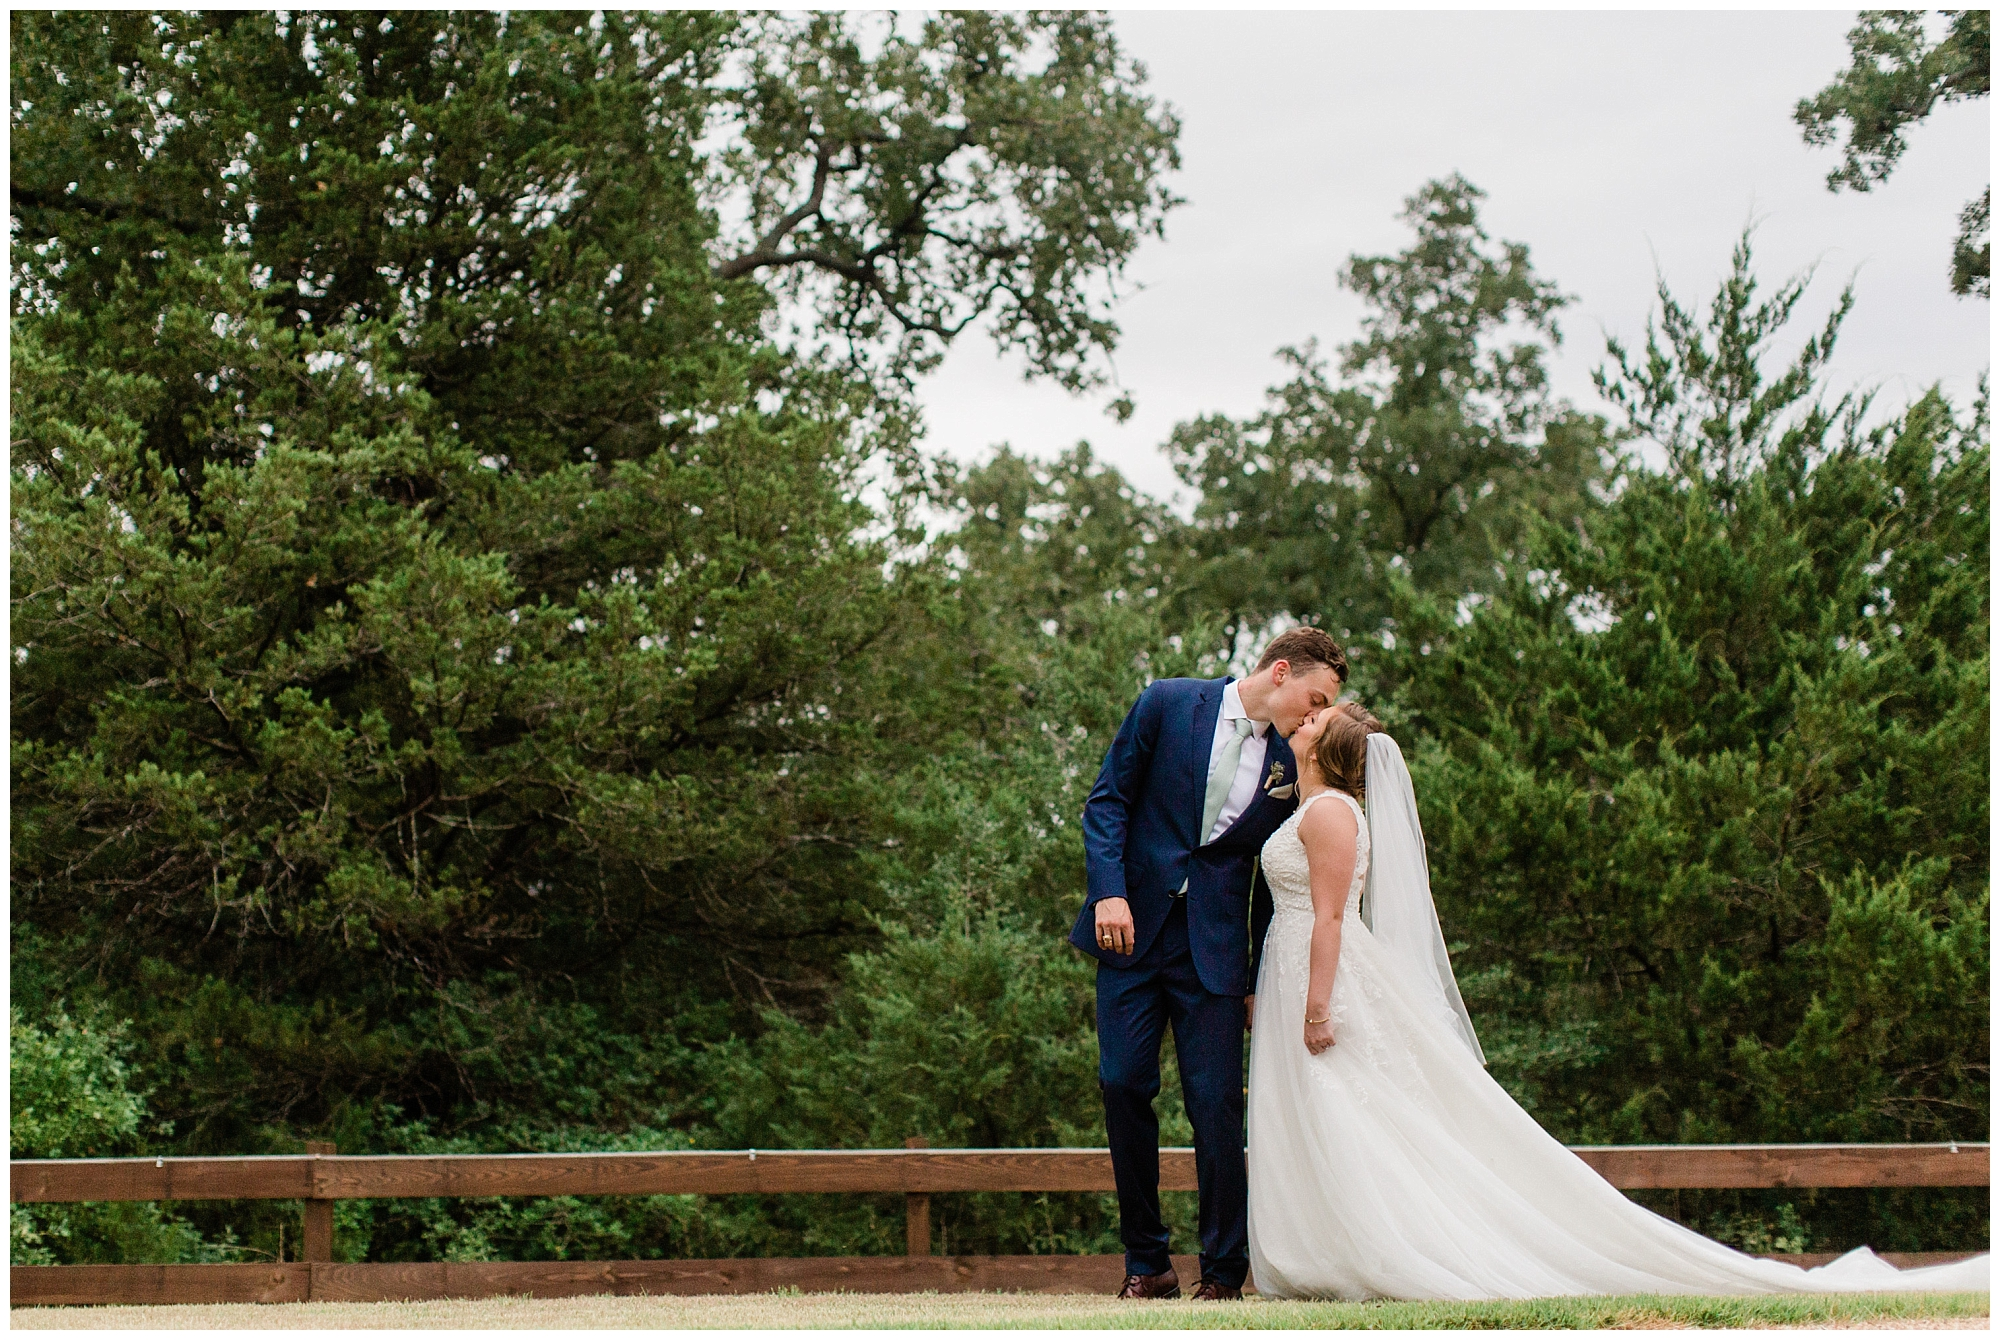 Peach_Creek_Ranch_Wedding_0001.jpg